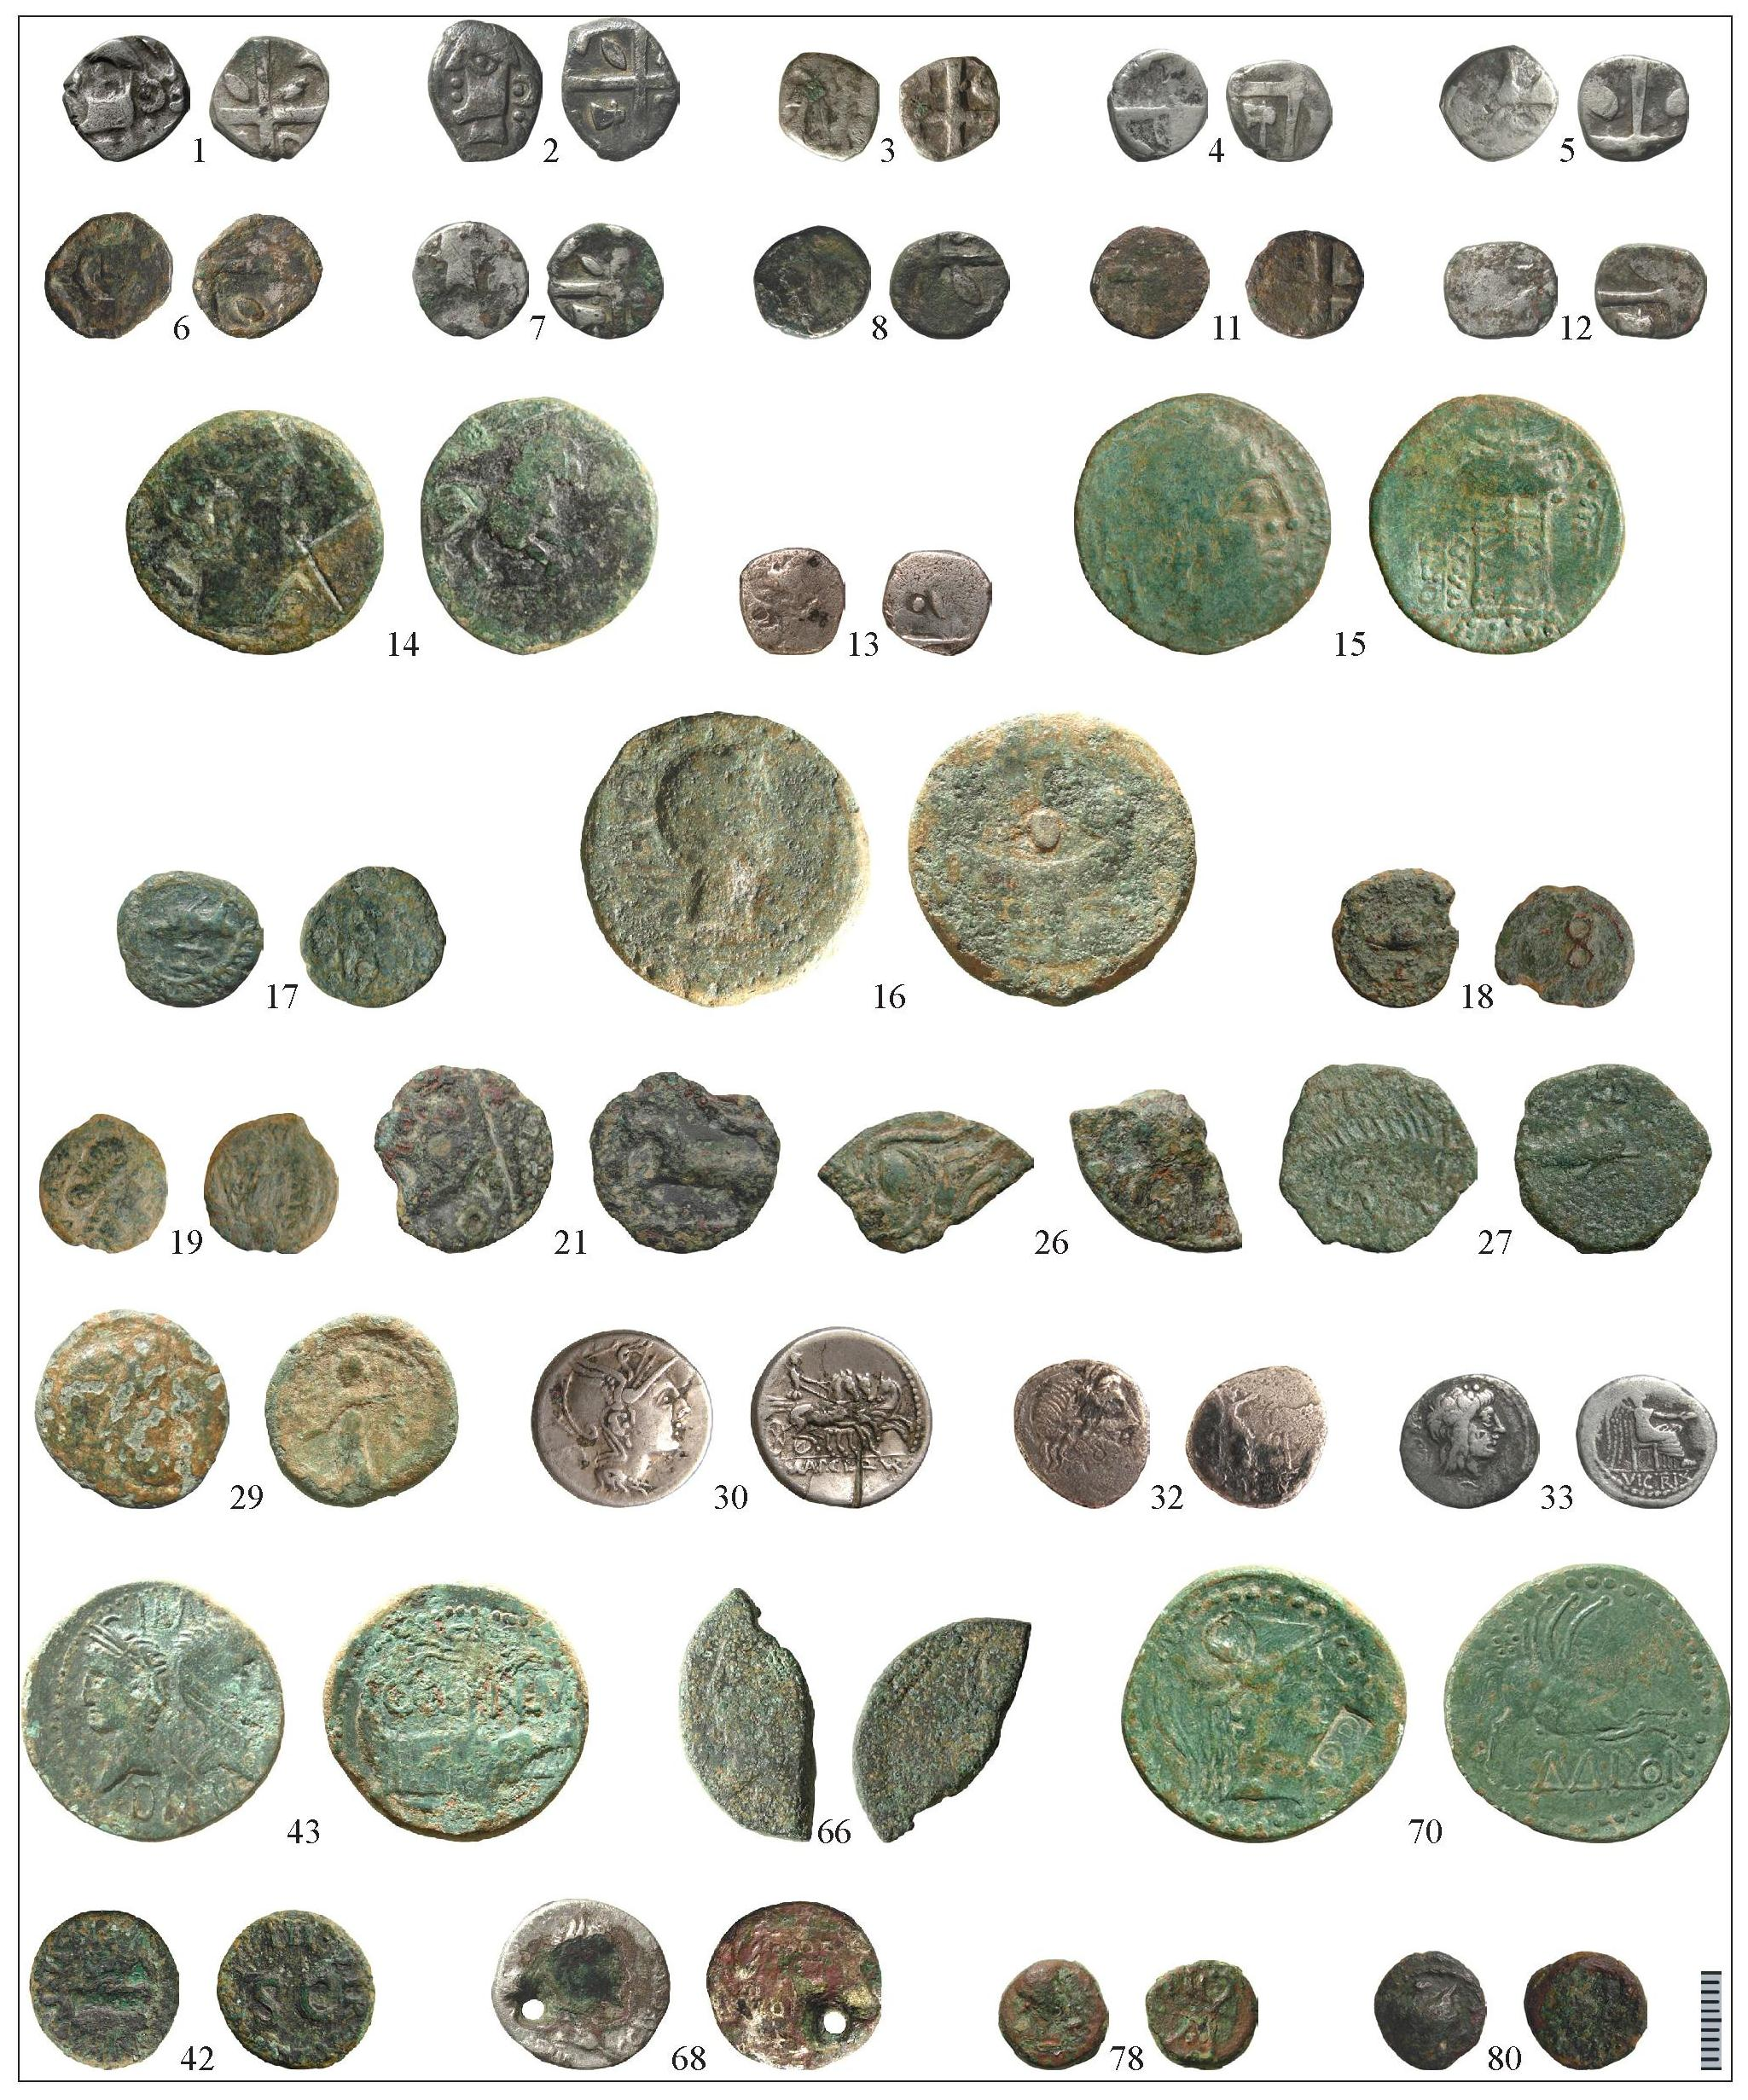 Useful Empire Romain Maiorina 348-350 Alexandrie Constans - Fel Temp Reparatio